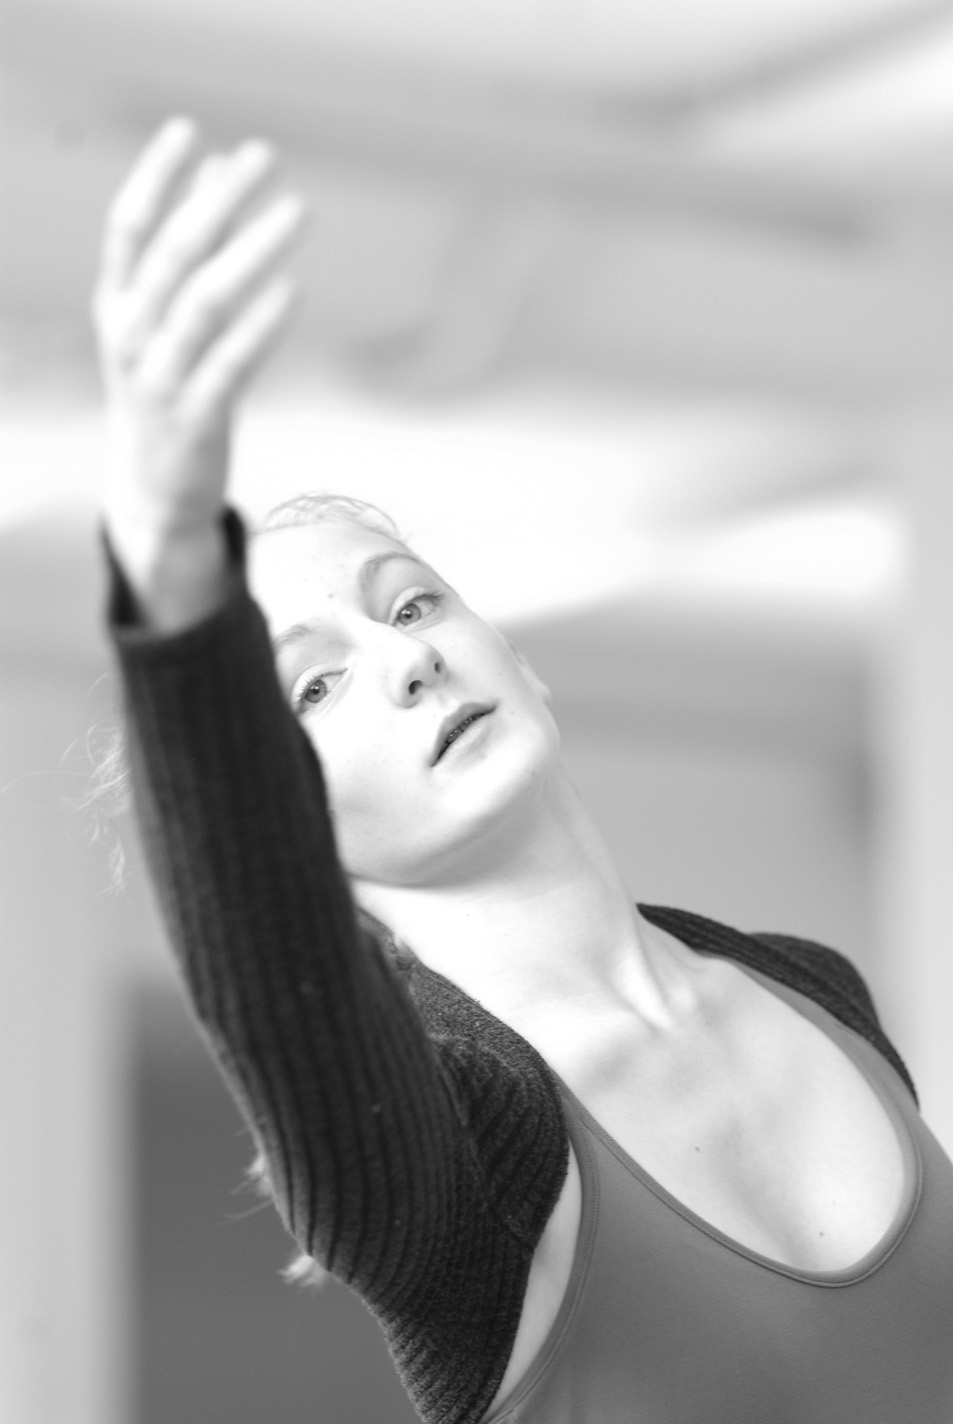 EN REPETITION - Anouchka Studemann - © tristan pfund (1).jpg